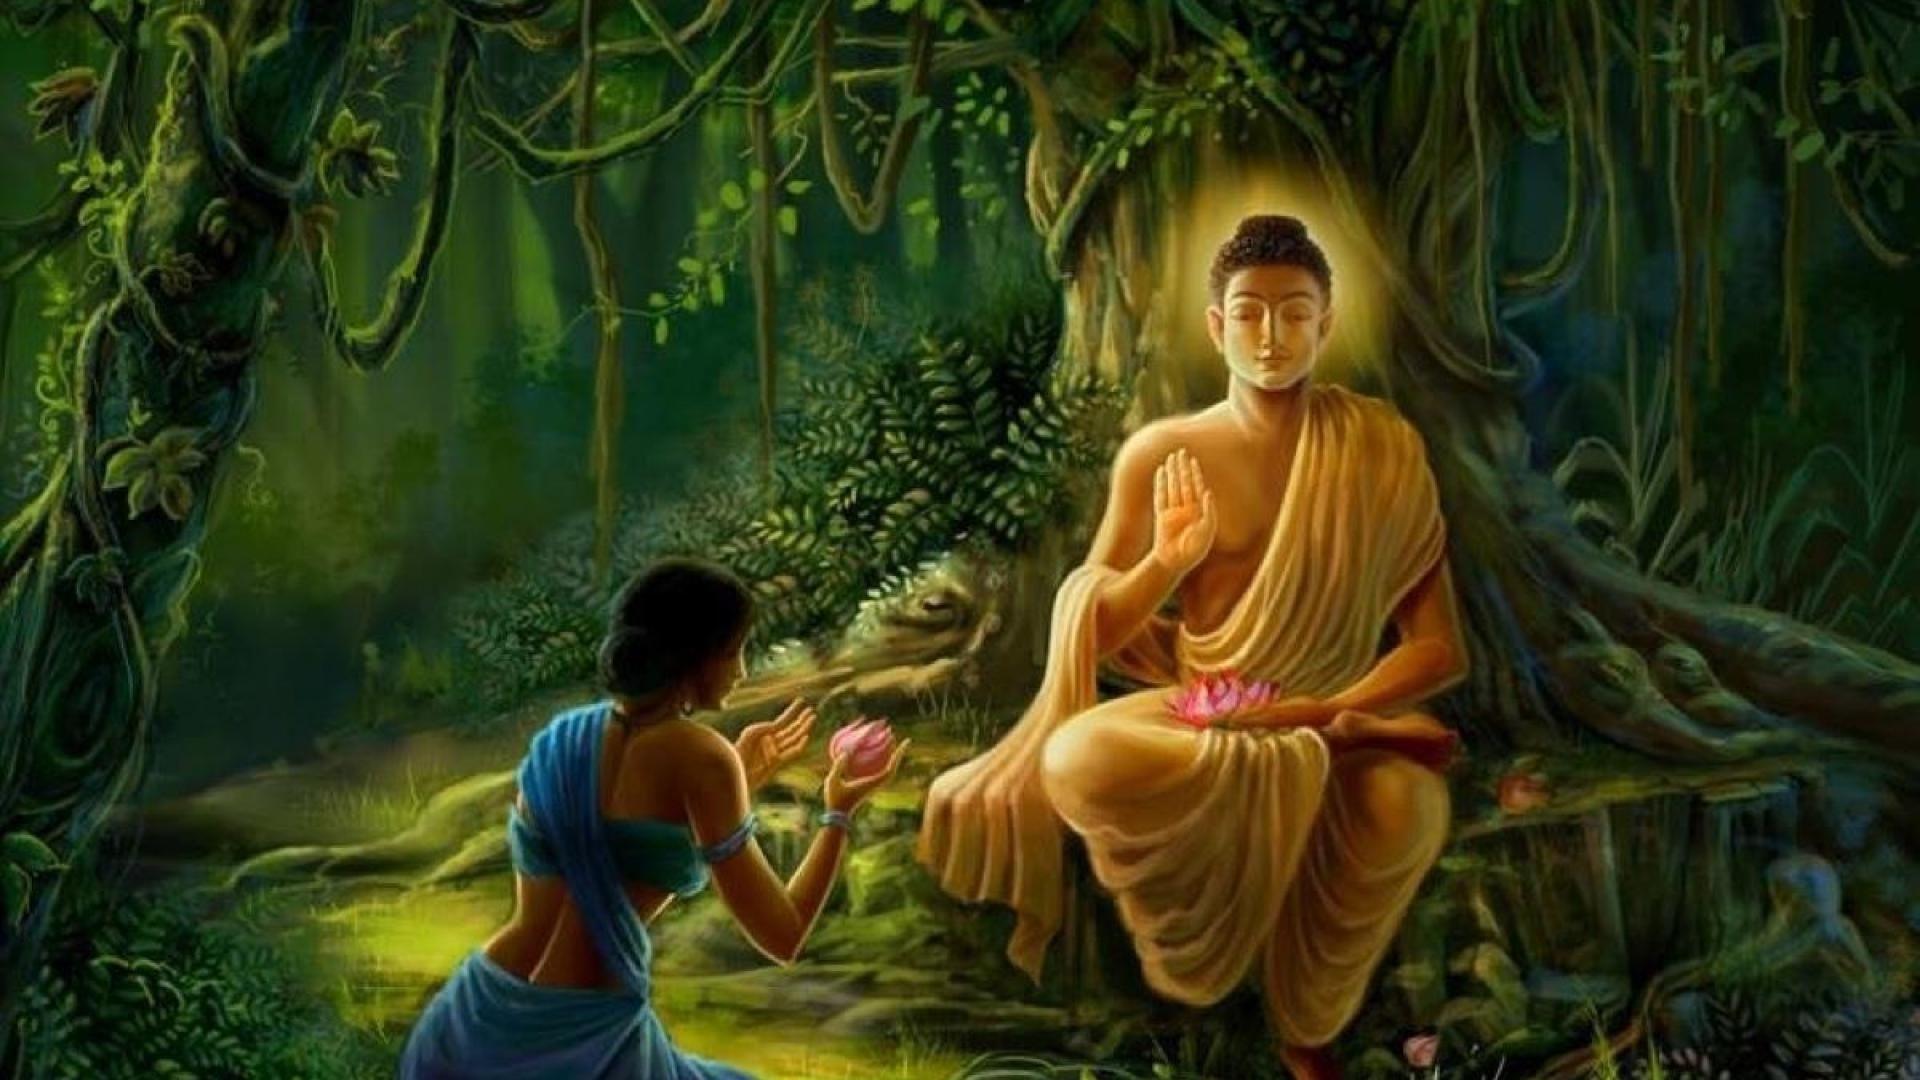 buddha wallpaper - http://www.siwallpaperhd/spirit-buddha